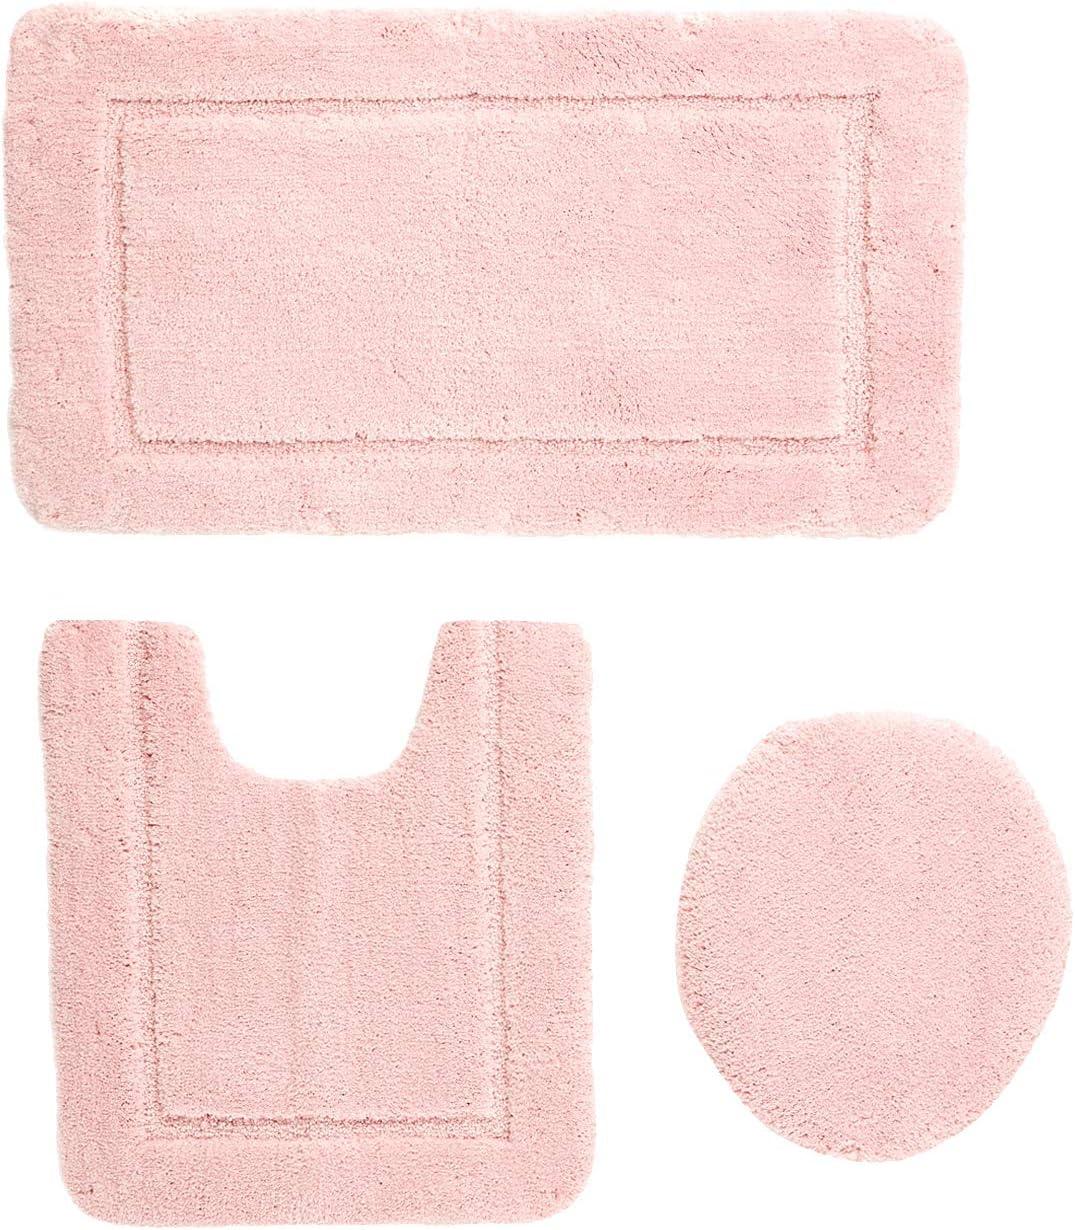 AmazonBasics 3 Piece Sculpted Bath Mat Set - Pink